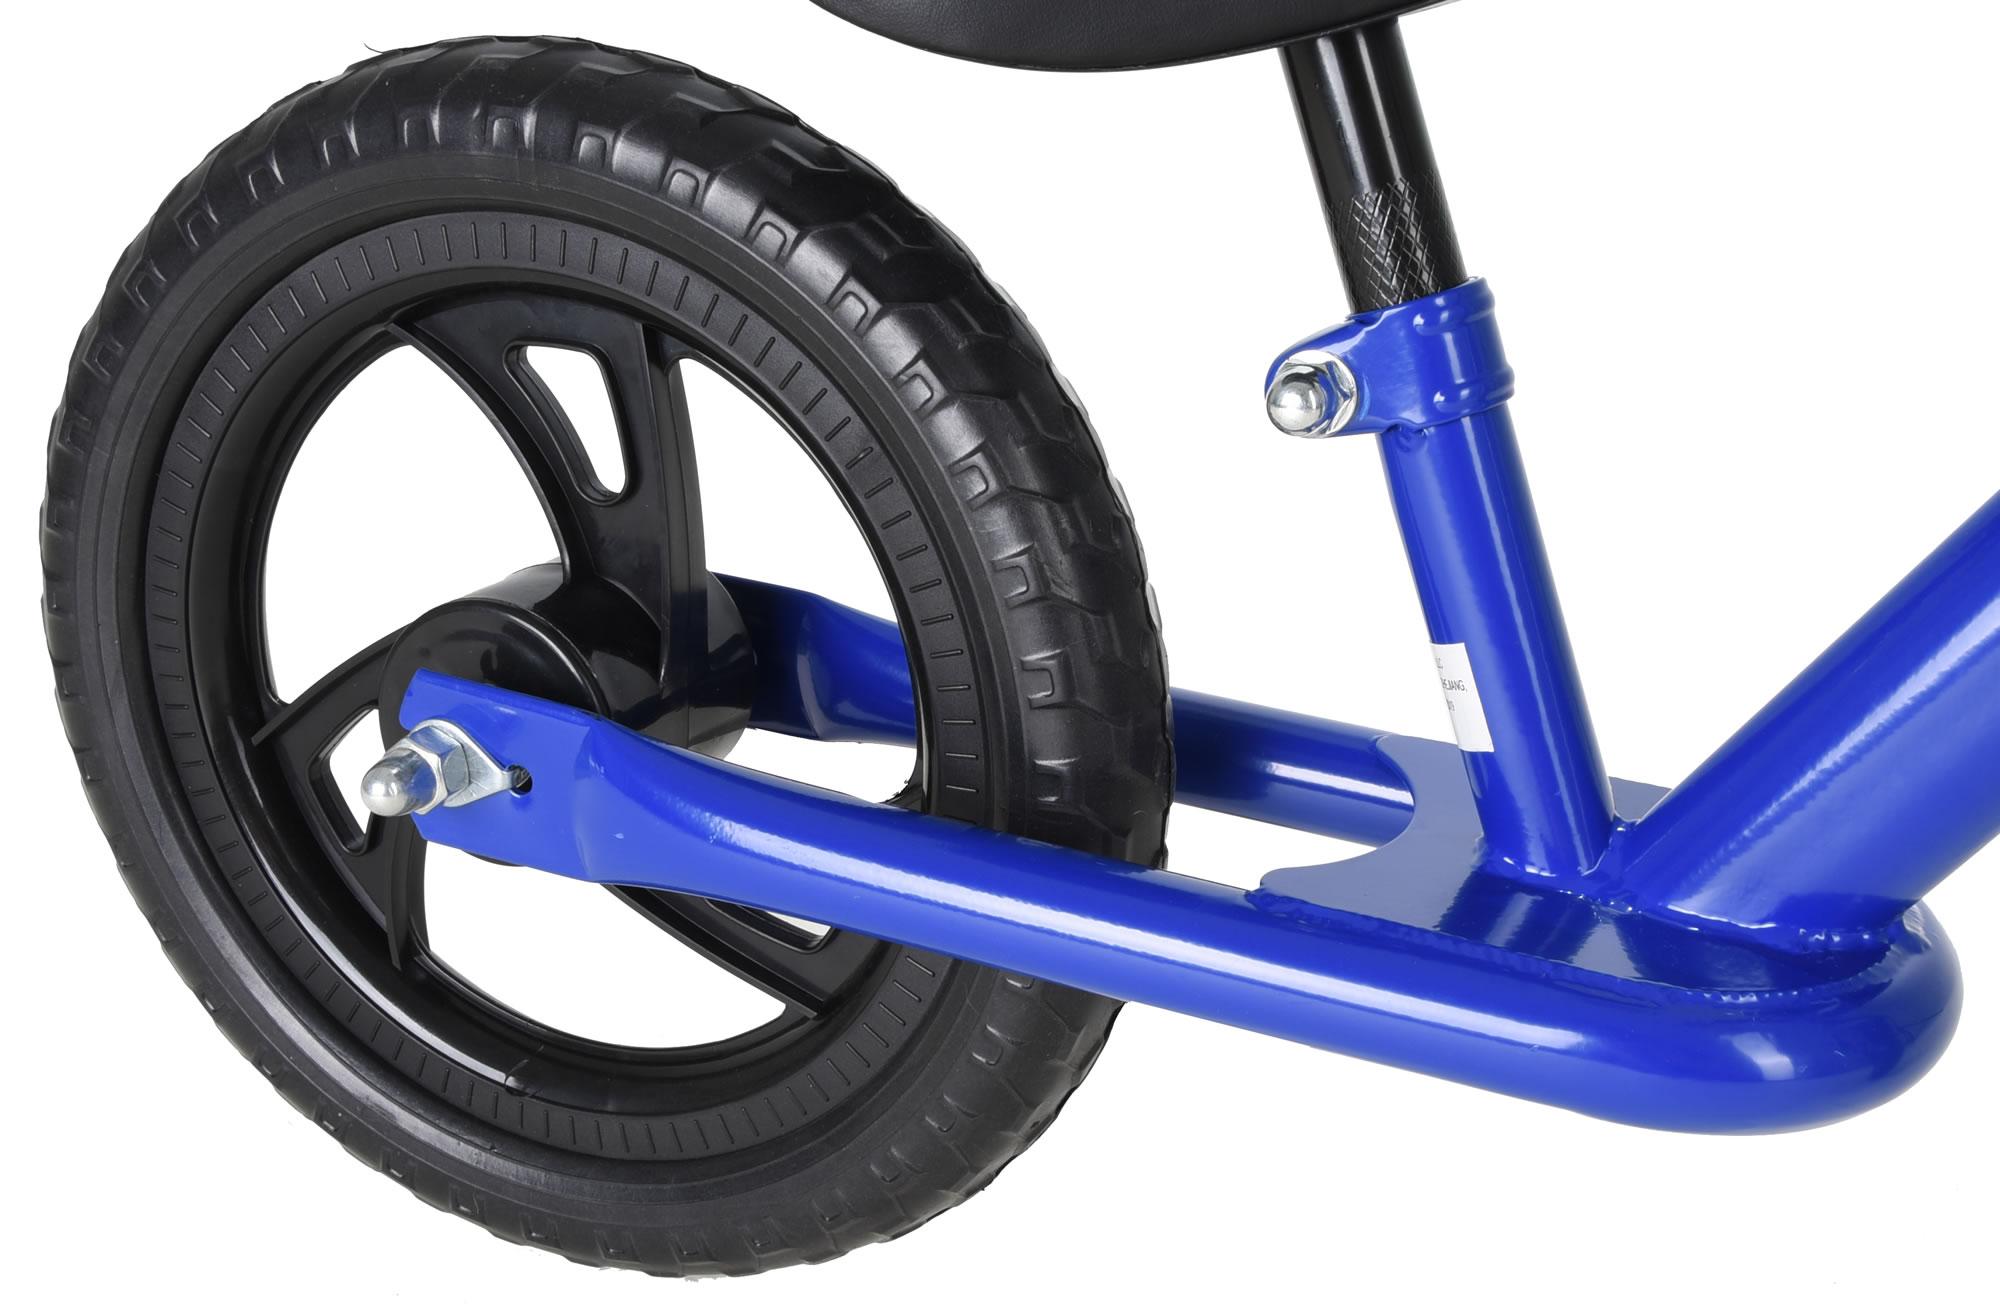 Vilano-Rally-Childrens-Balance-Bike-No-Pedal-Toddler-Push-Bicycle thumbnail 9